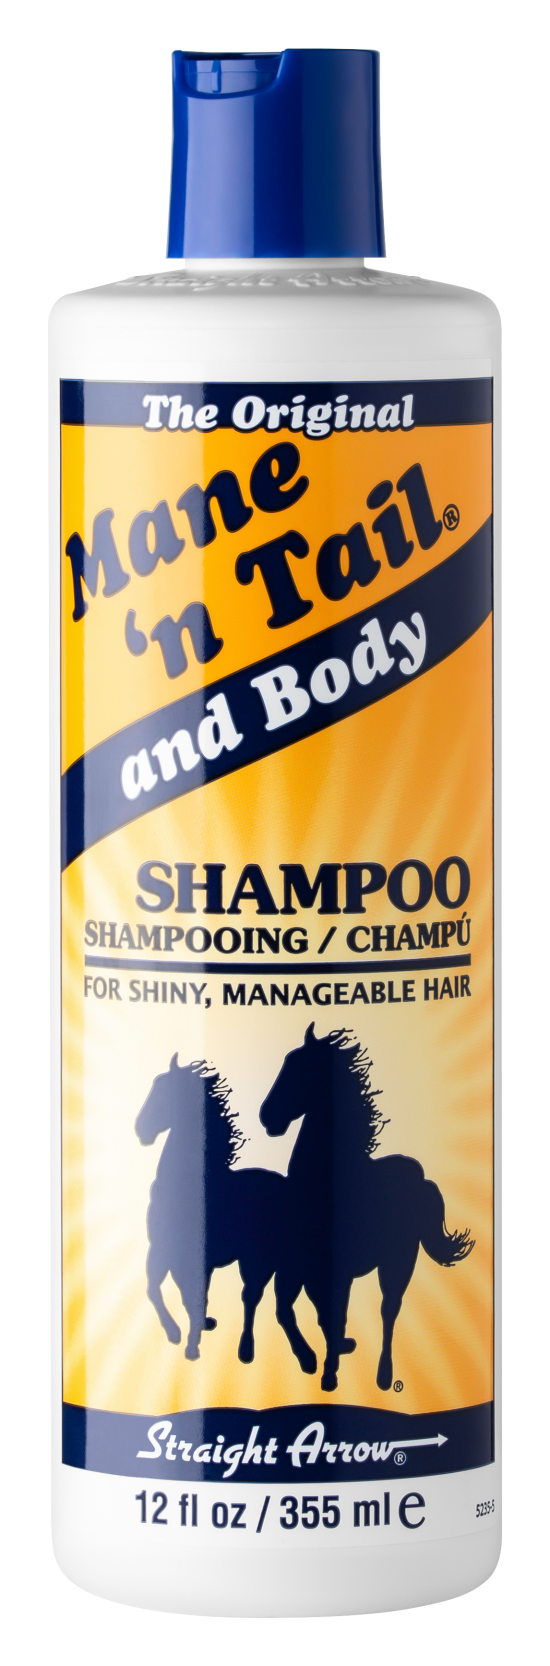 Mane 'n Tail And Body Shampoo 12 oz bottle